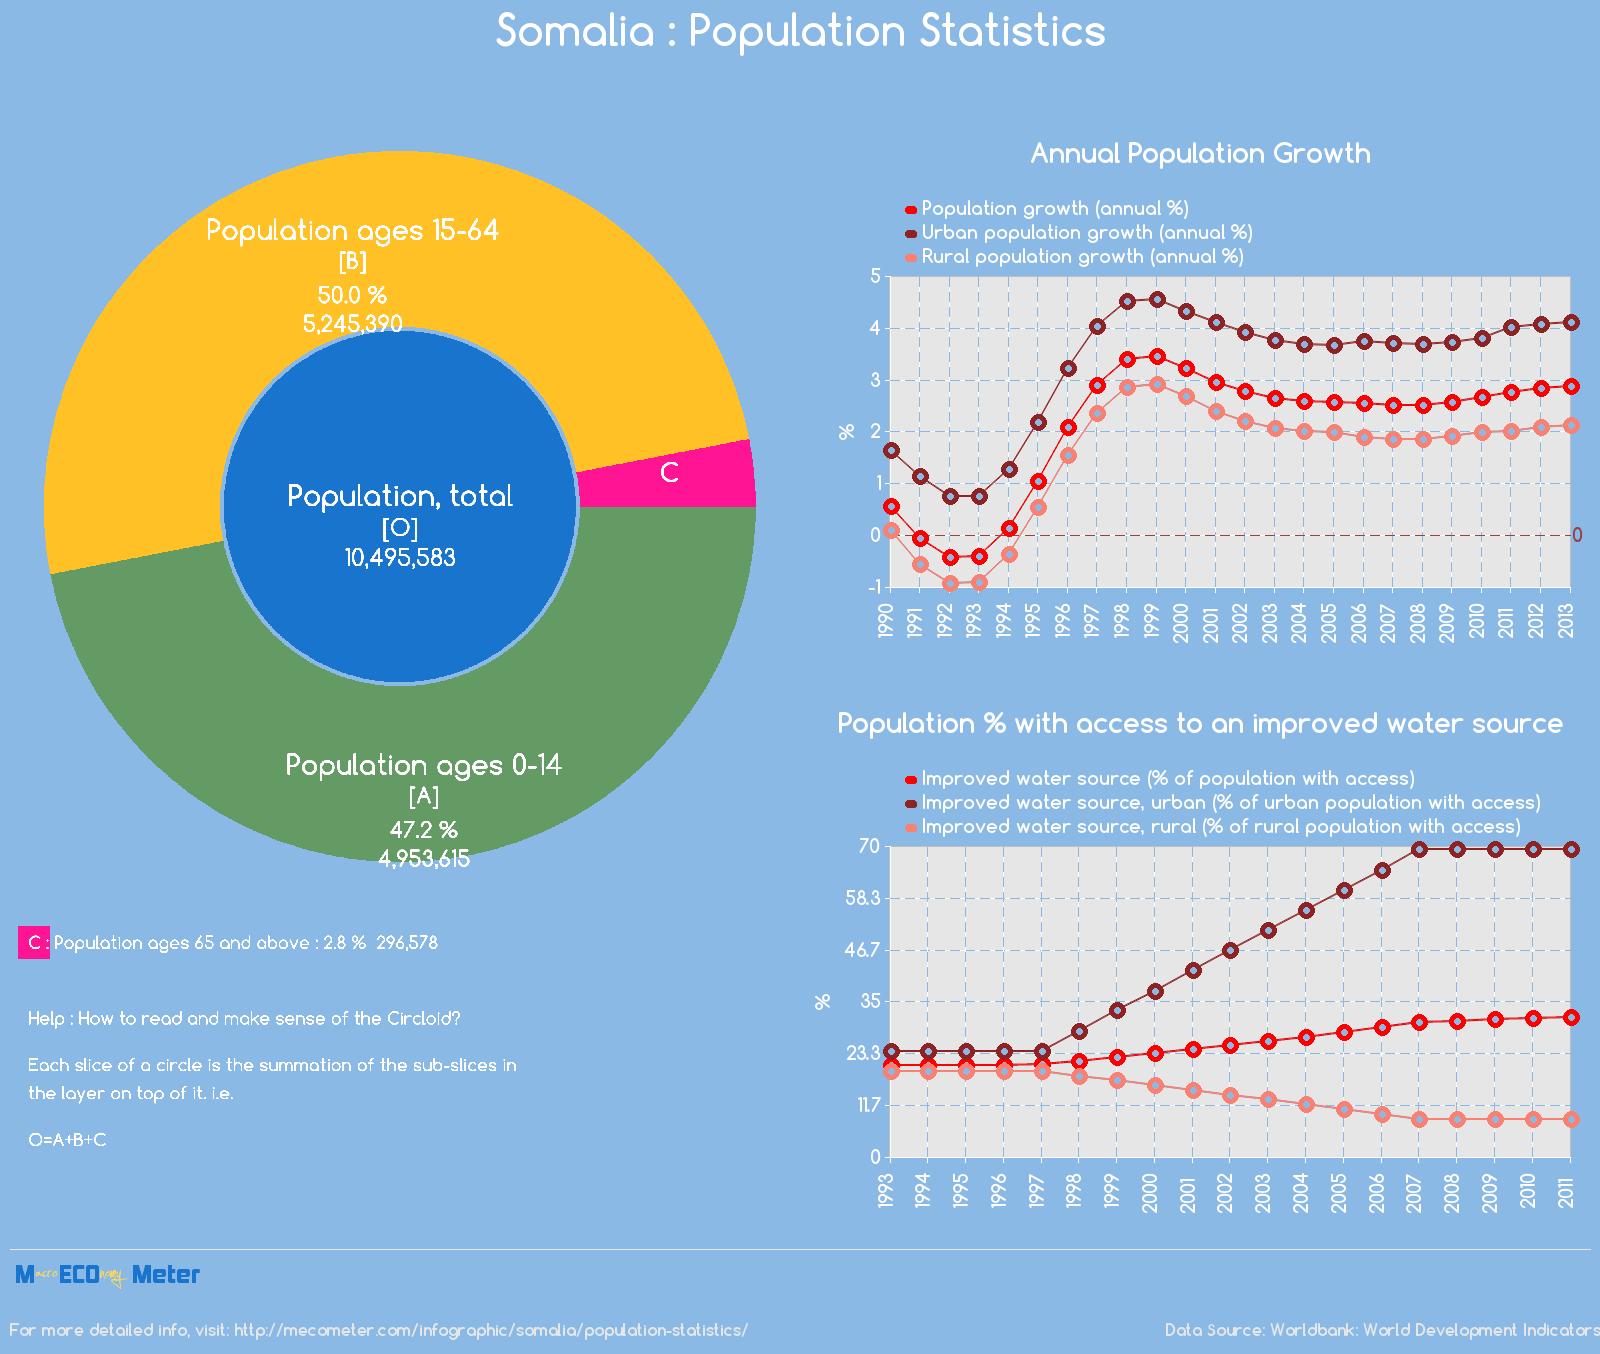 Somalia : Population Statistics